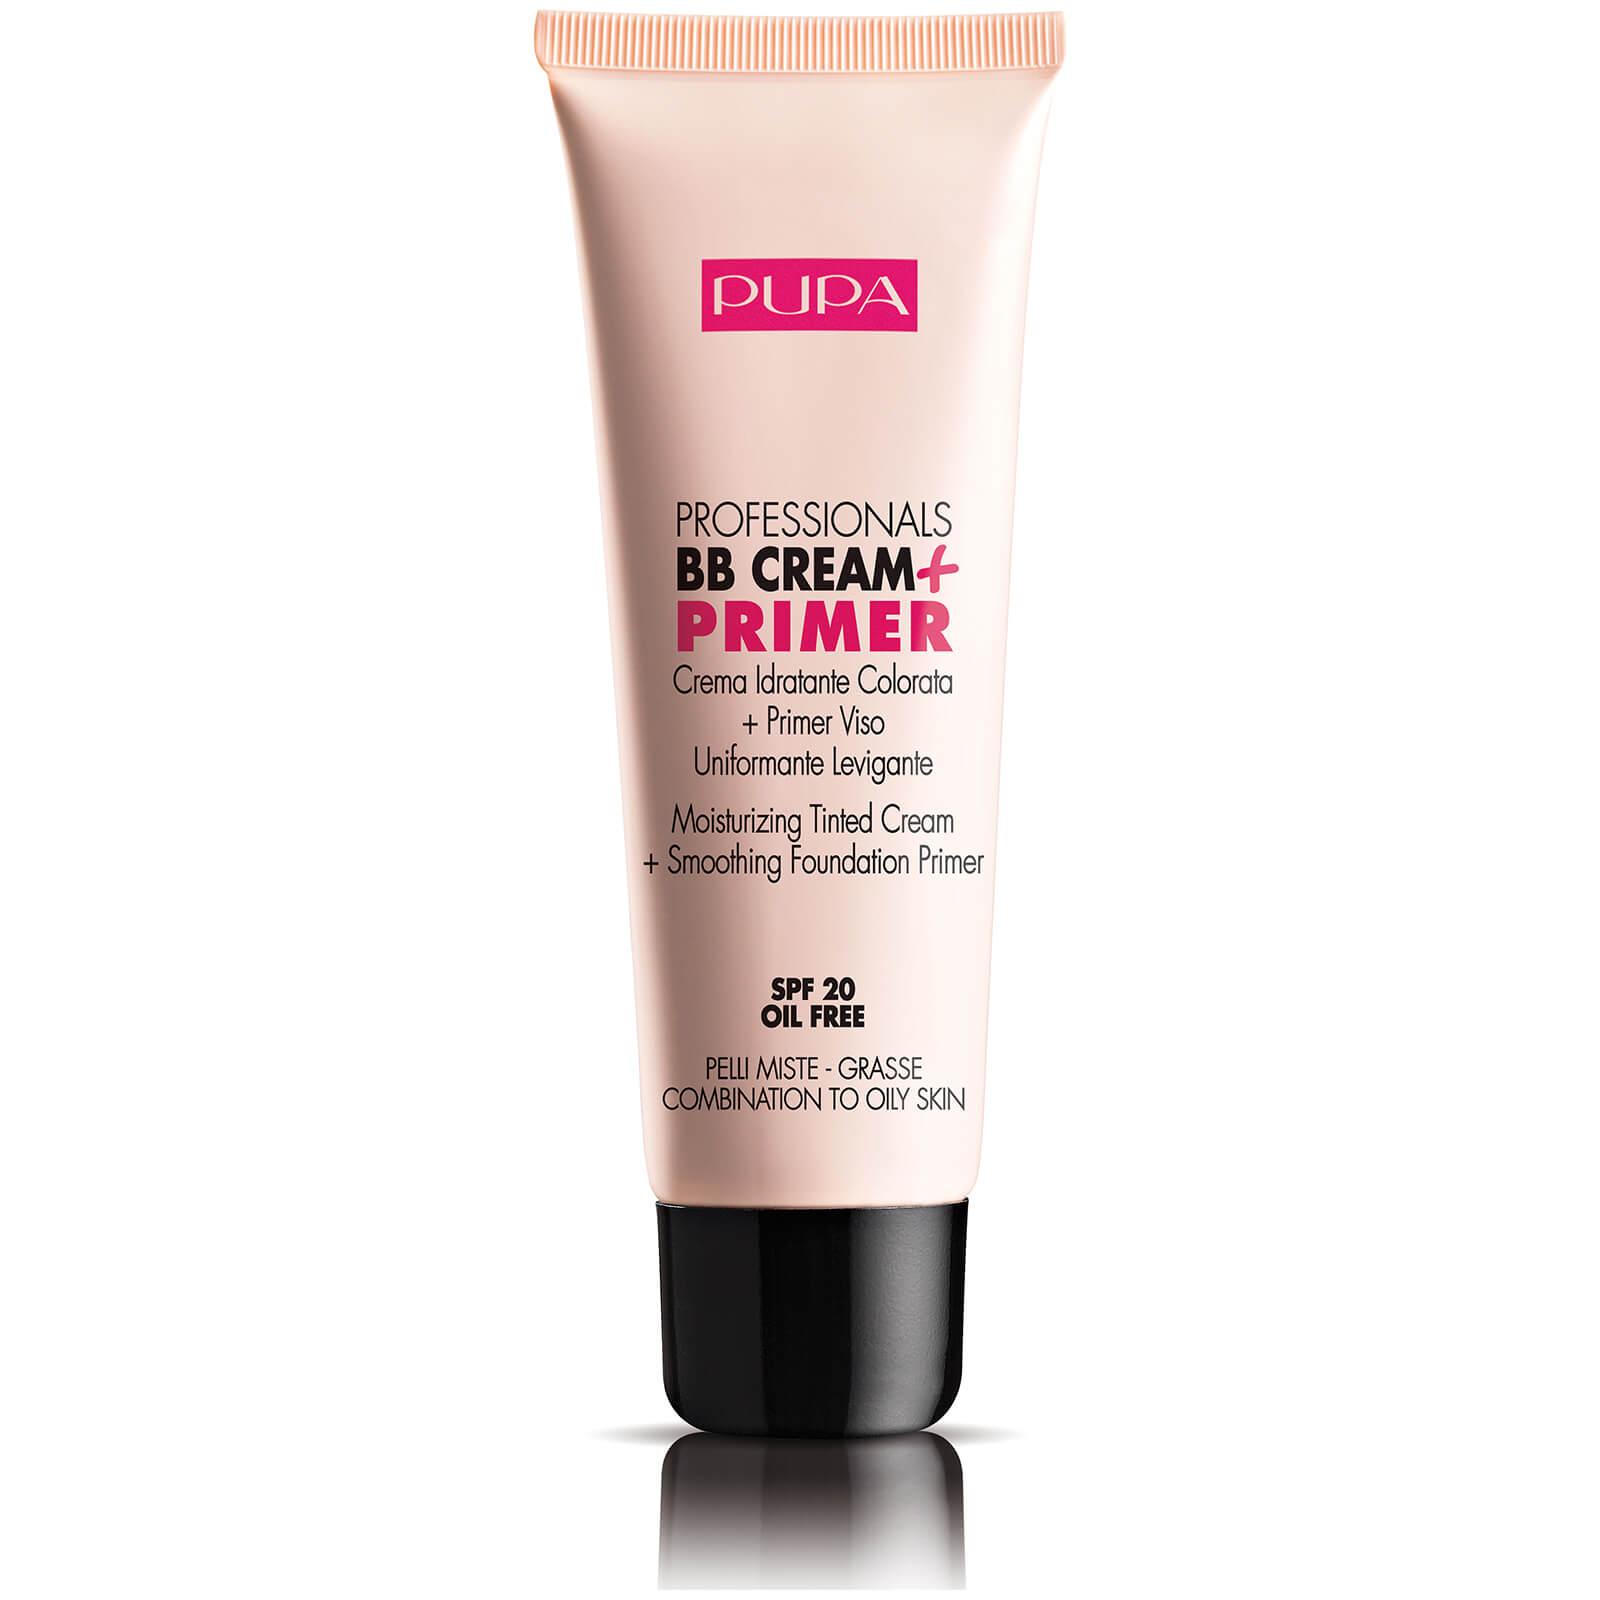 PUPA Professionals BB Cream Primer for Combination-Oily Skin - Light/Medium